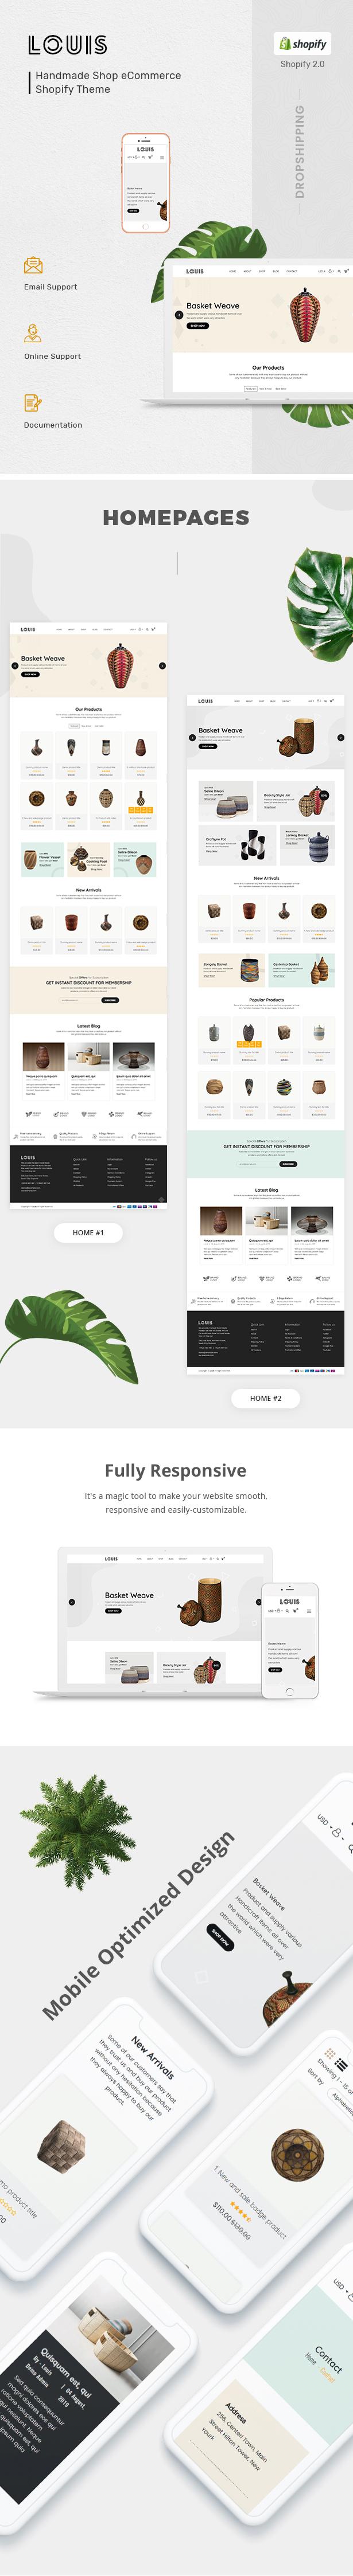 Handmade & Craft Shopify Theme